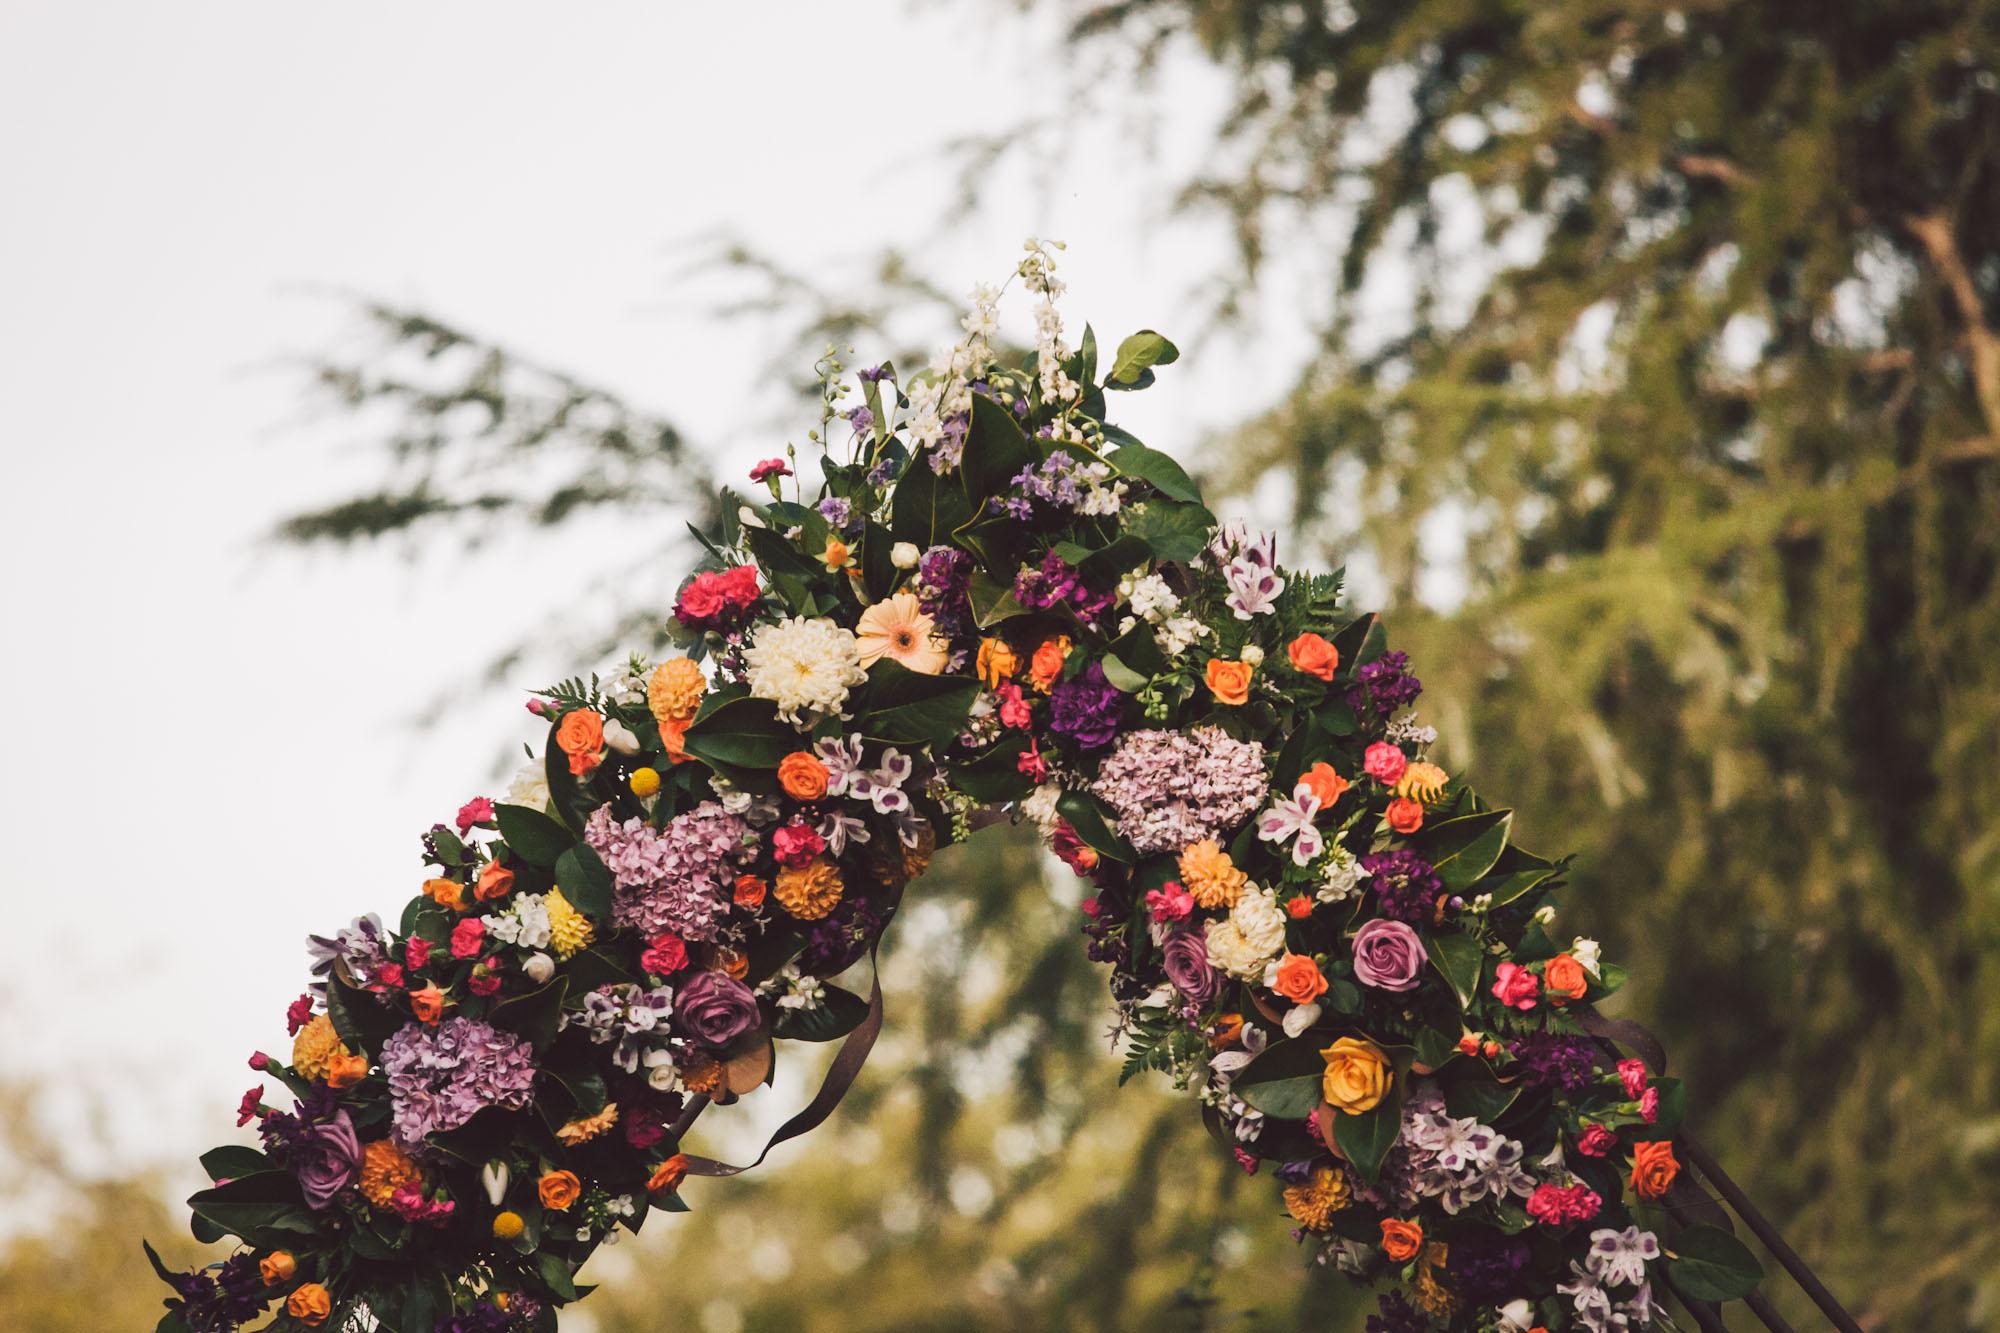 floral bower